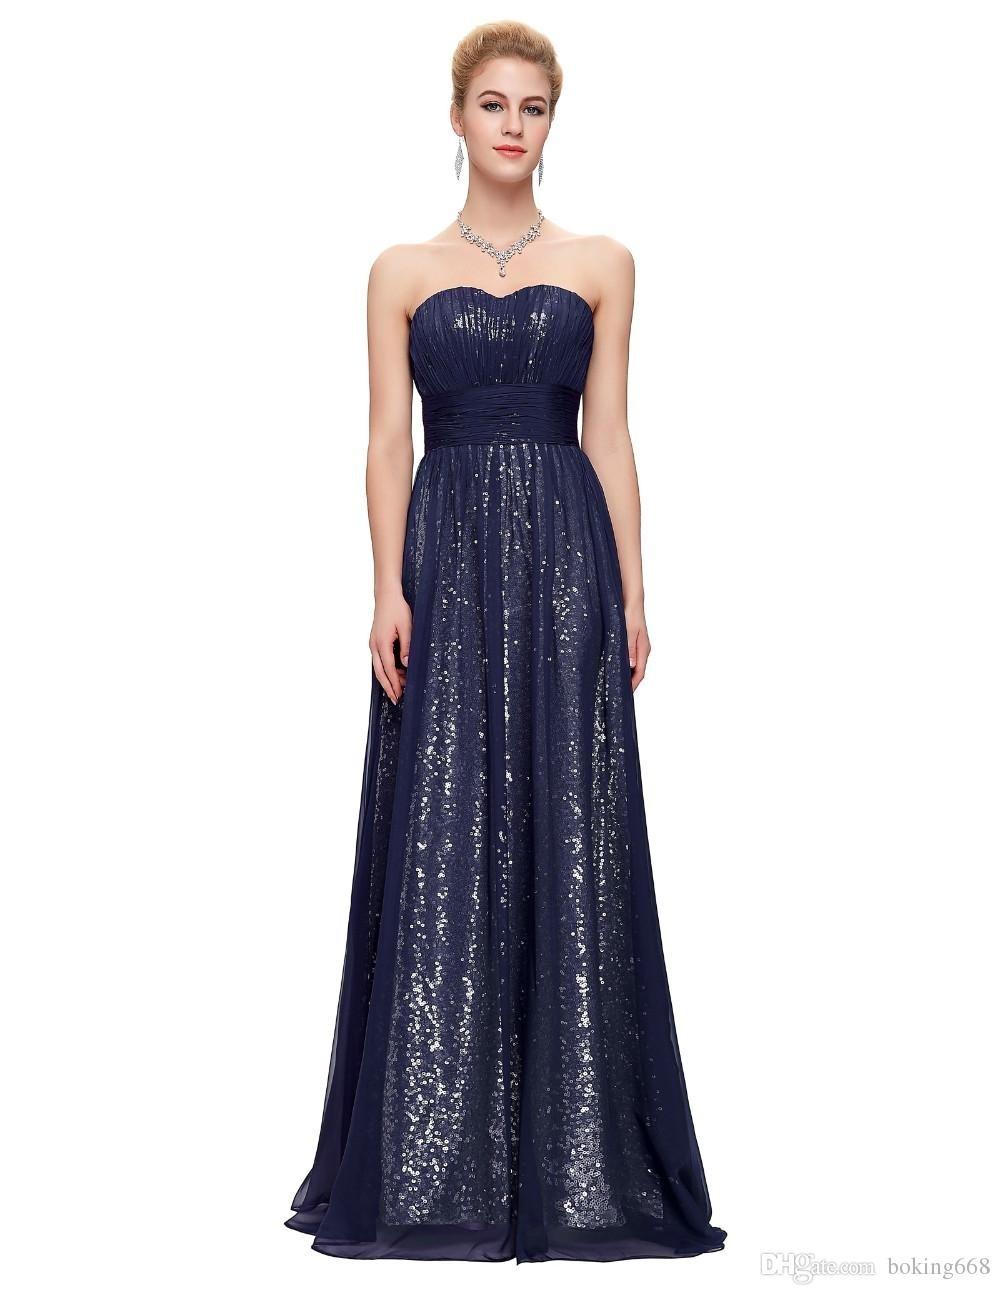 13 Luxurius Lange Abendkleider Elegant BoutiqueFormal Ausgezeichnet Lange Abendkleider Elegant für 2019